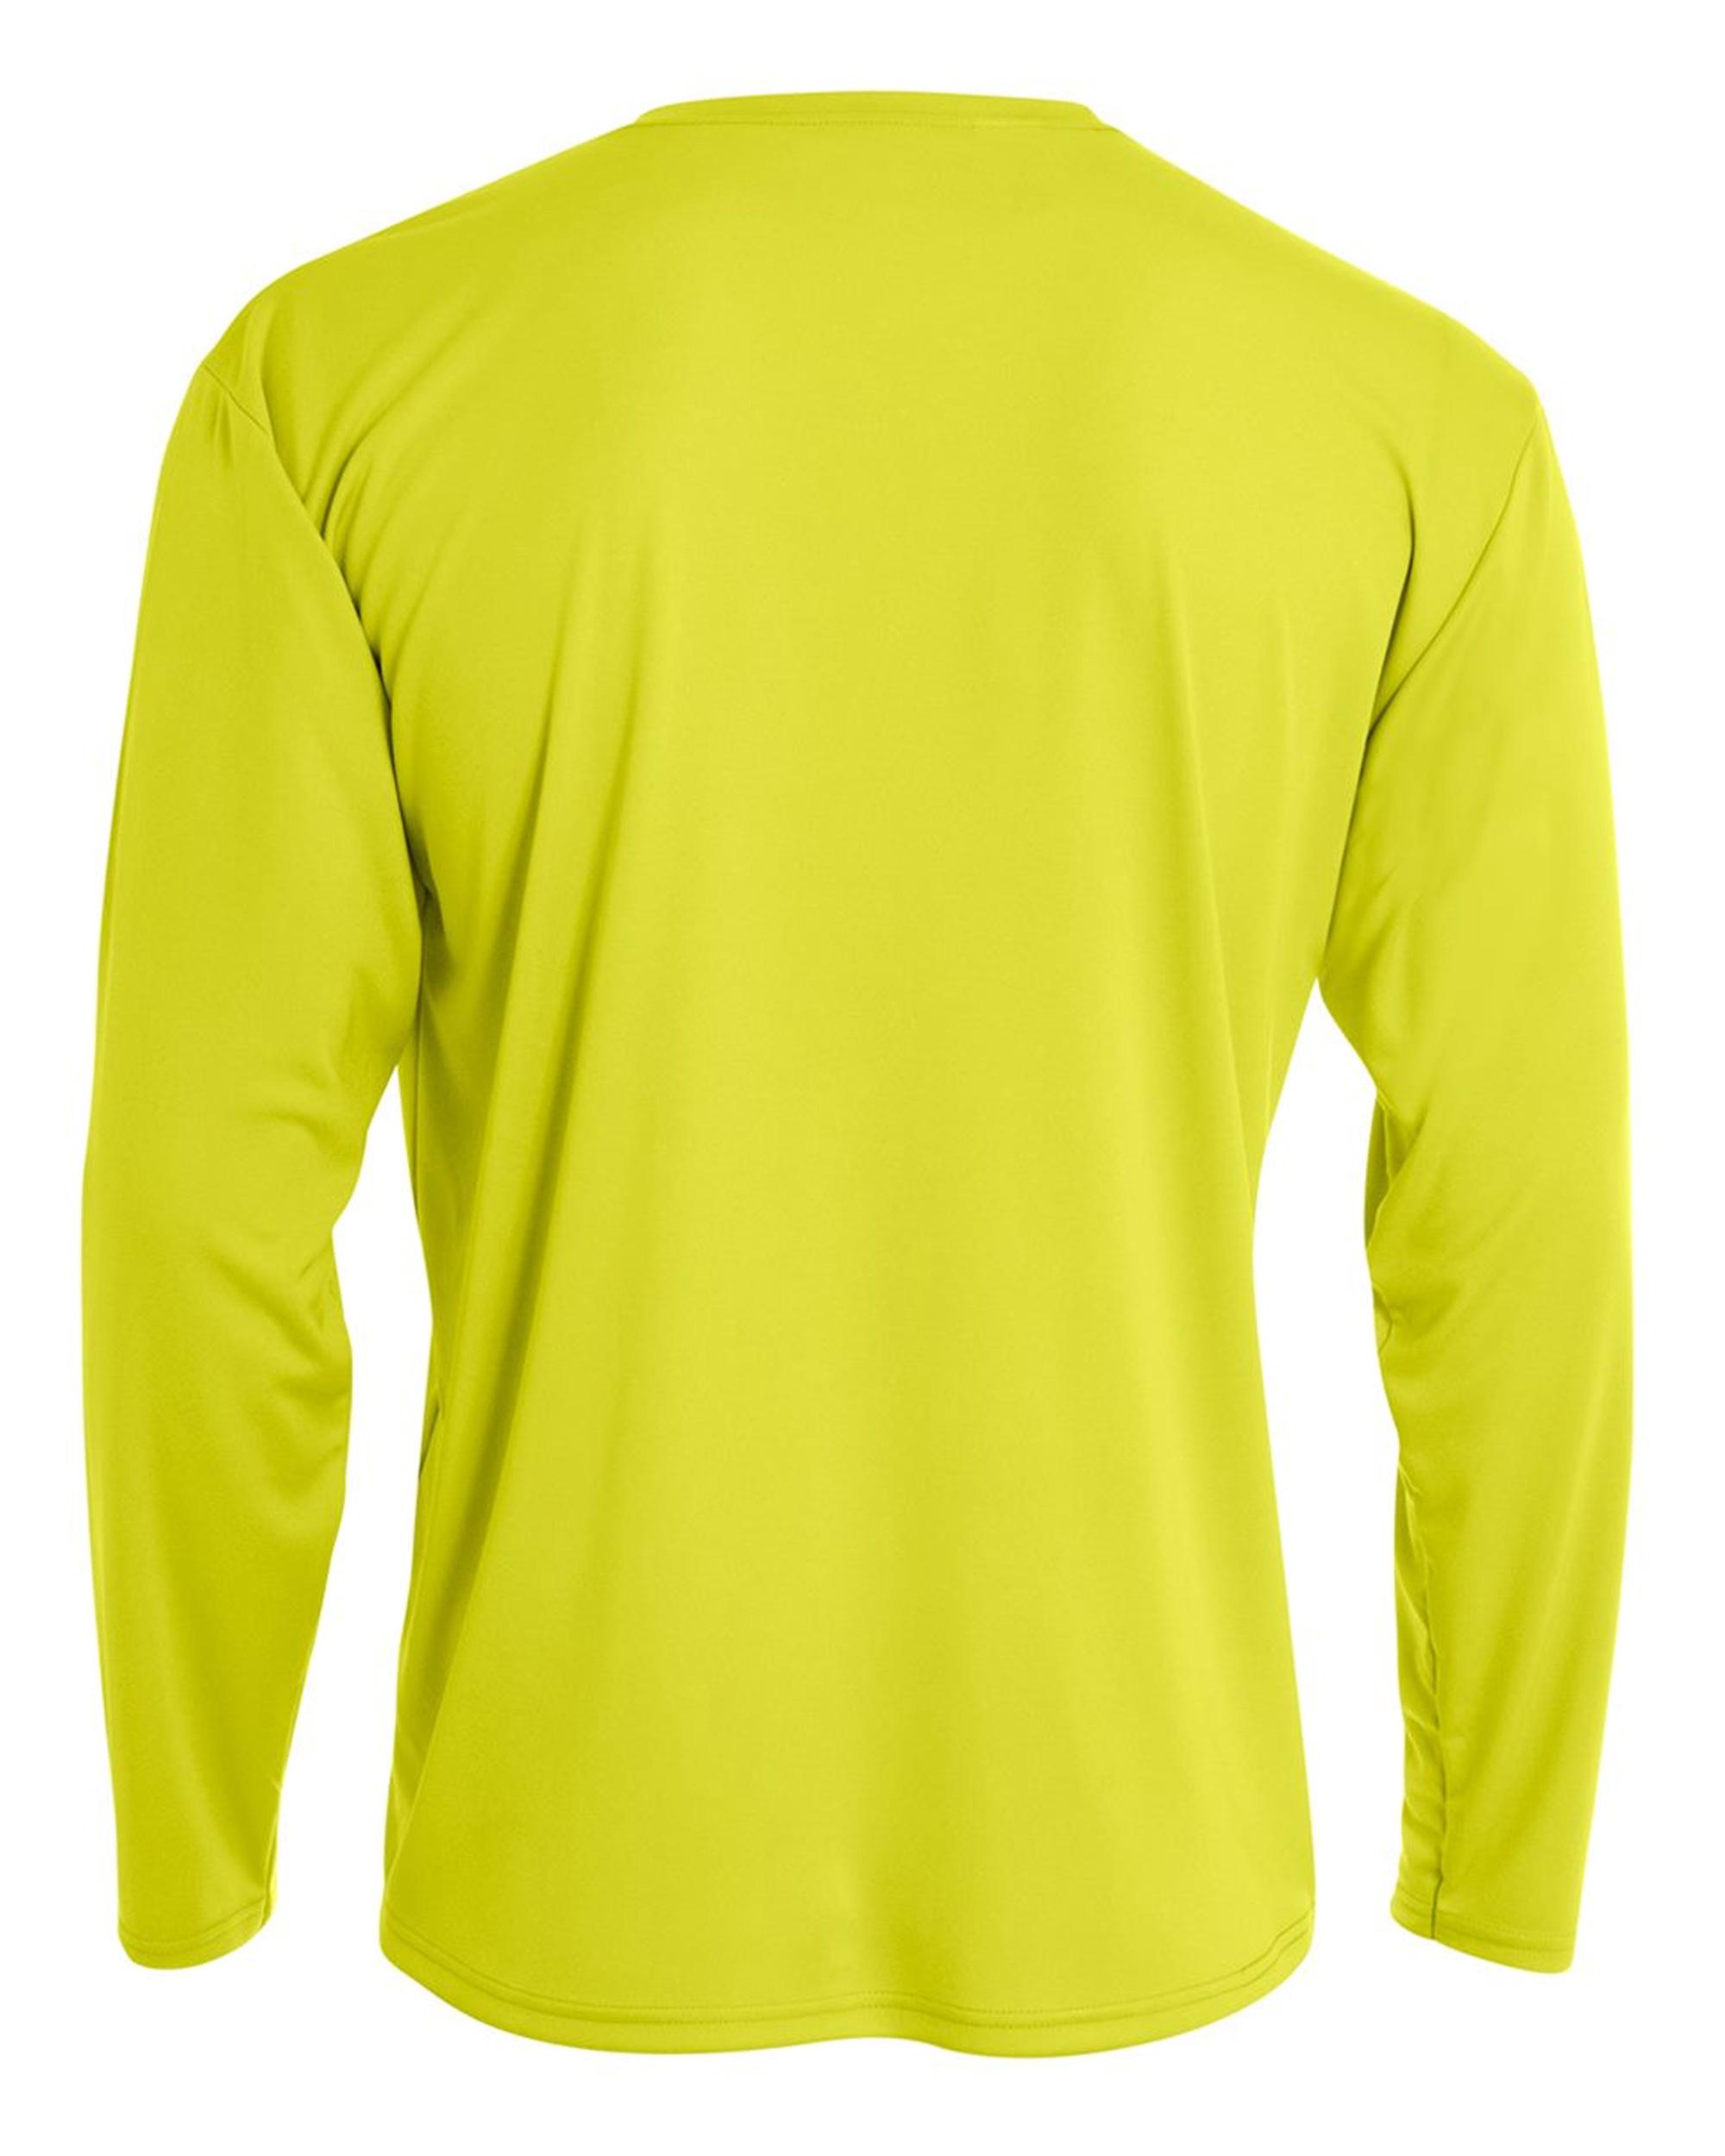 Men-039-s-Long-Sleeve-Loose-Fit-Rash-Guard-Surf-Shirt-Water-Sports-Swimwear thumbnail 22